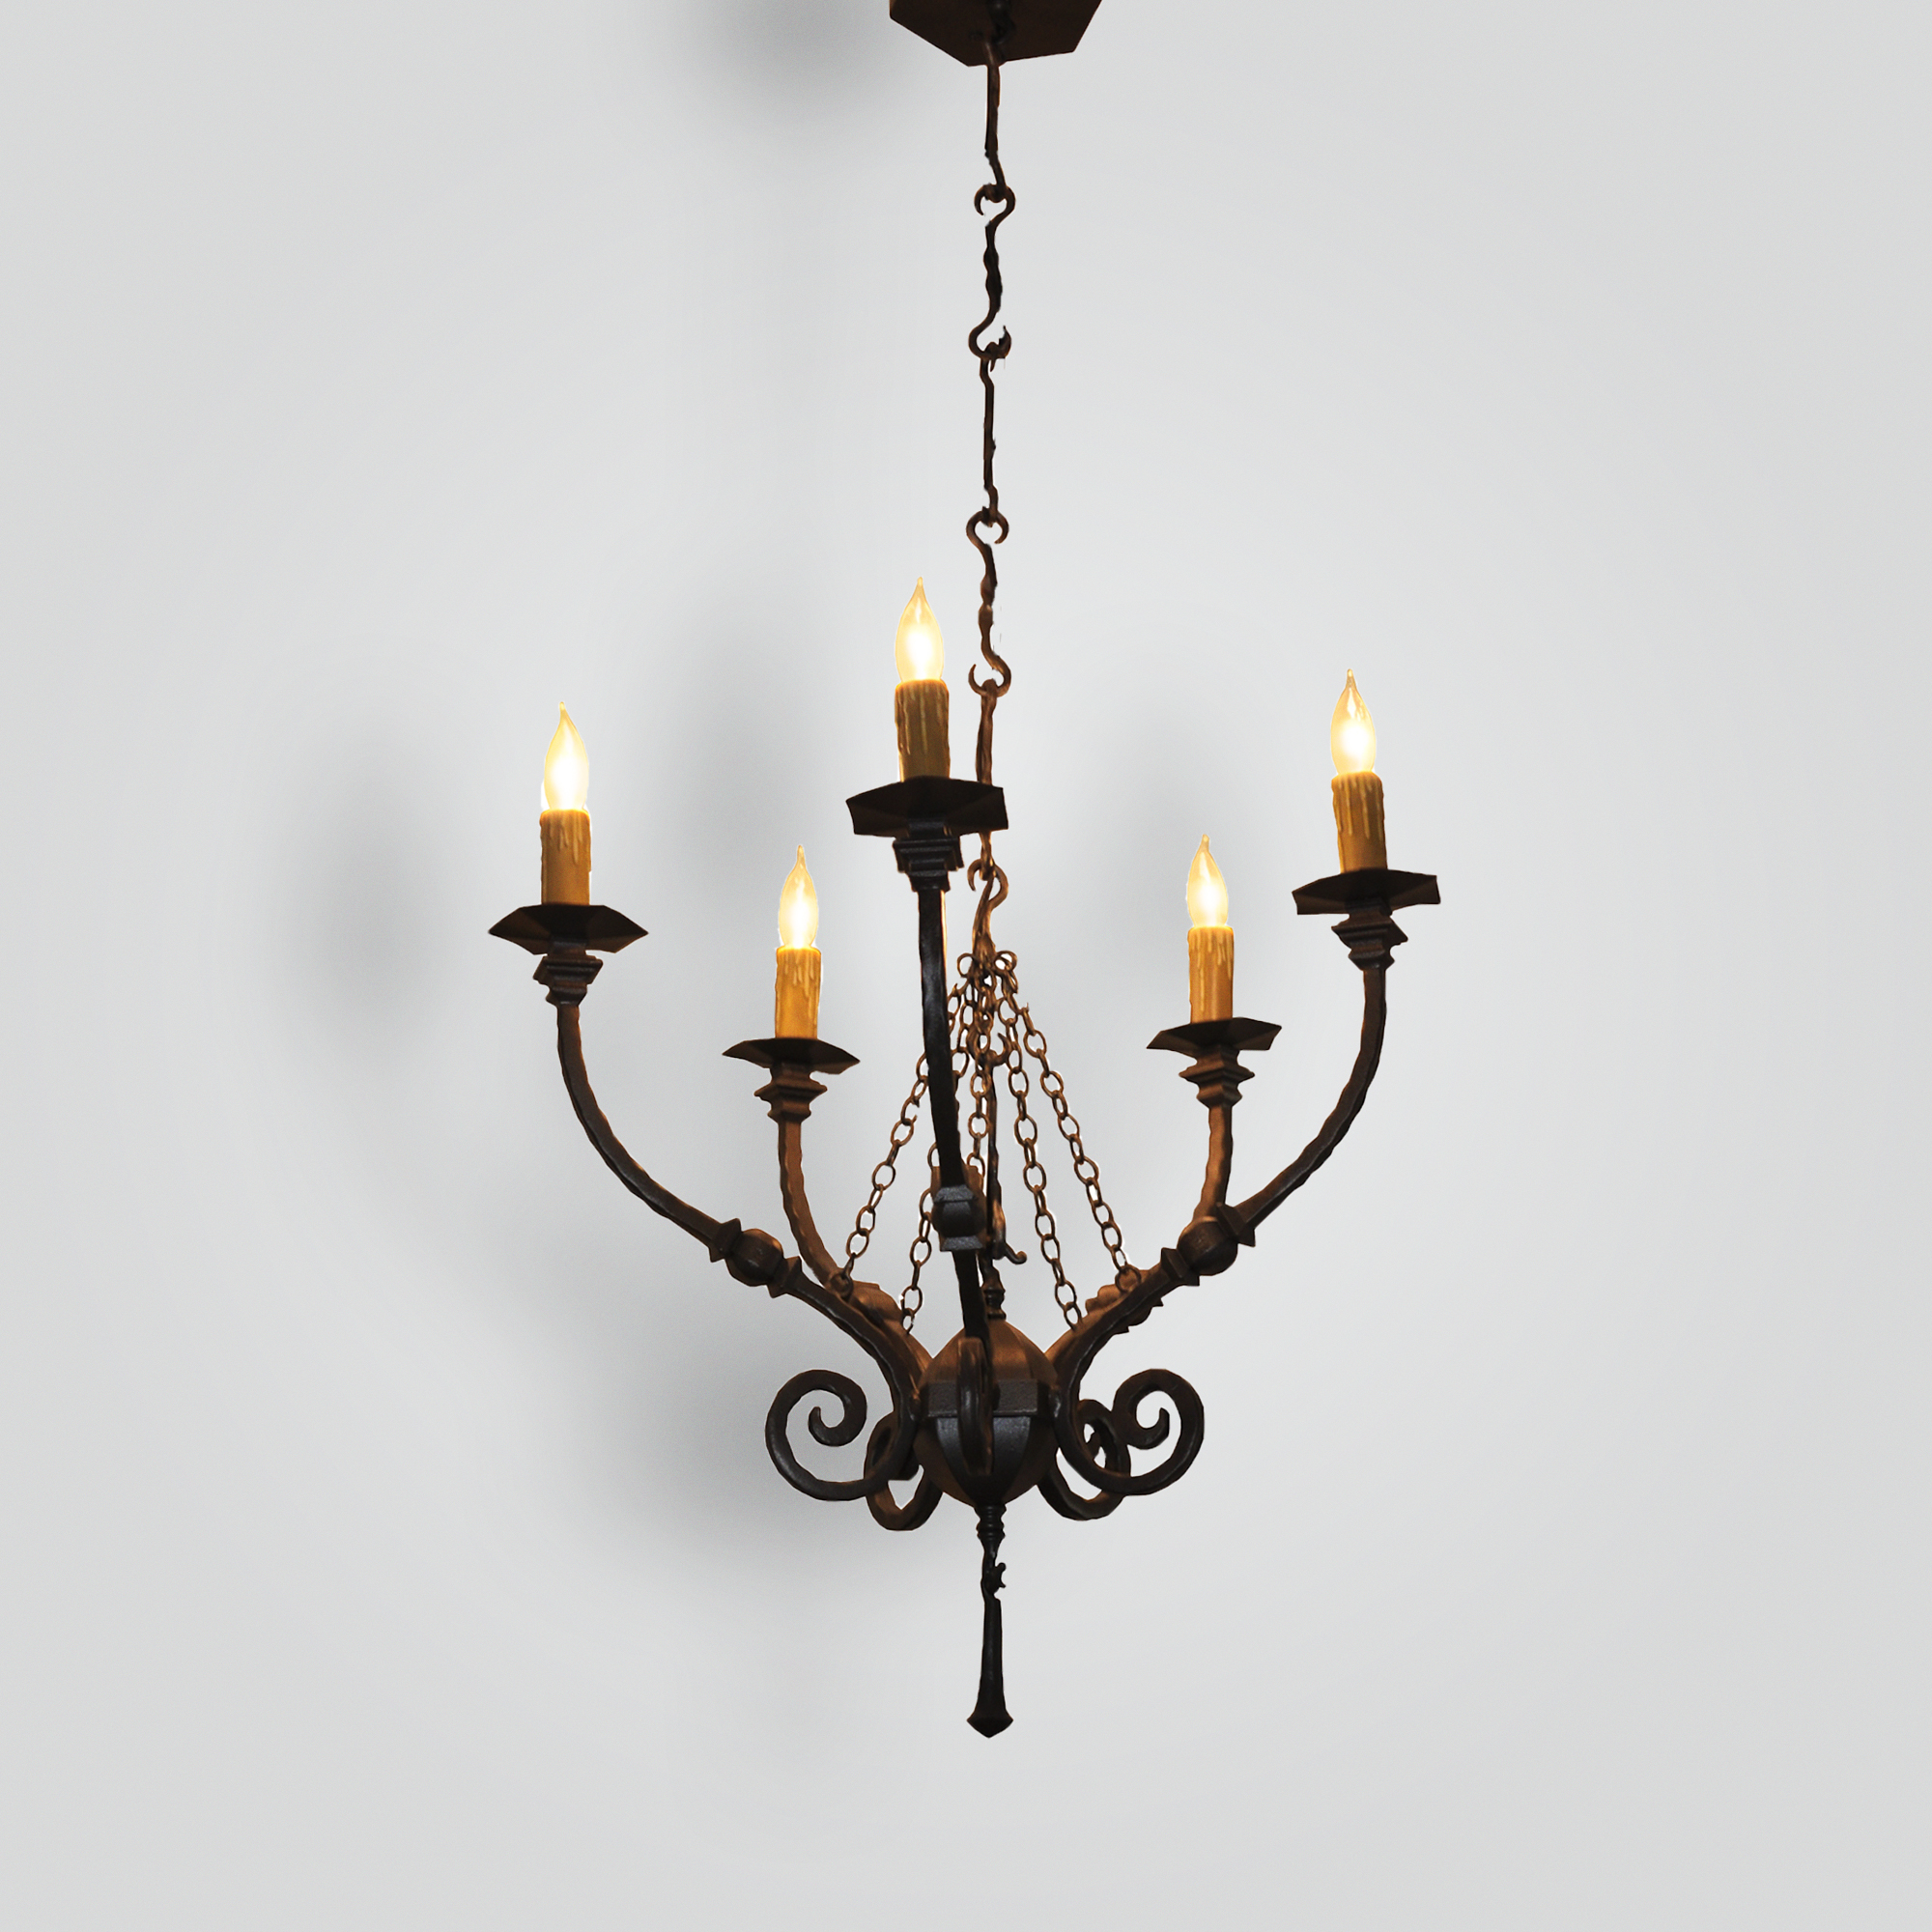 20126-mb5-ir-pen-ba-5-lite-wrought-iron-chandelier – ADG Lighting Collection